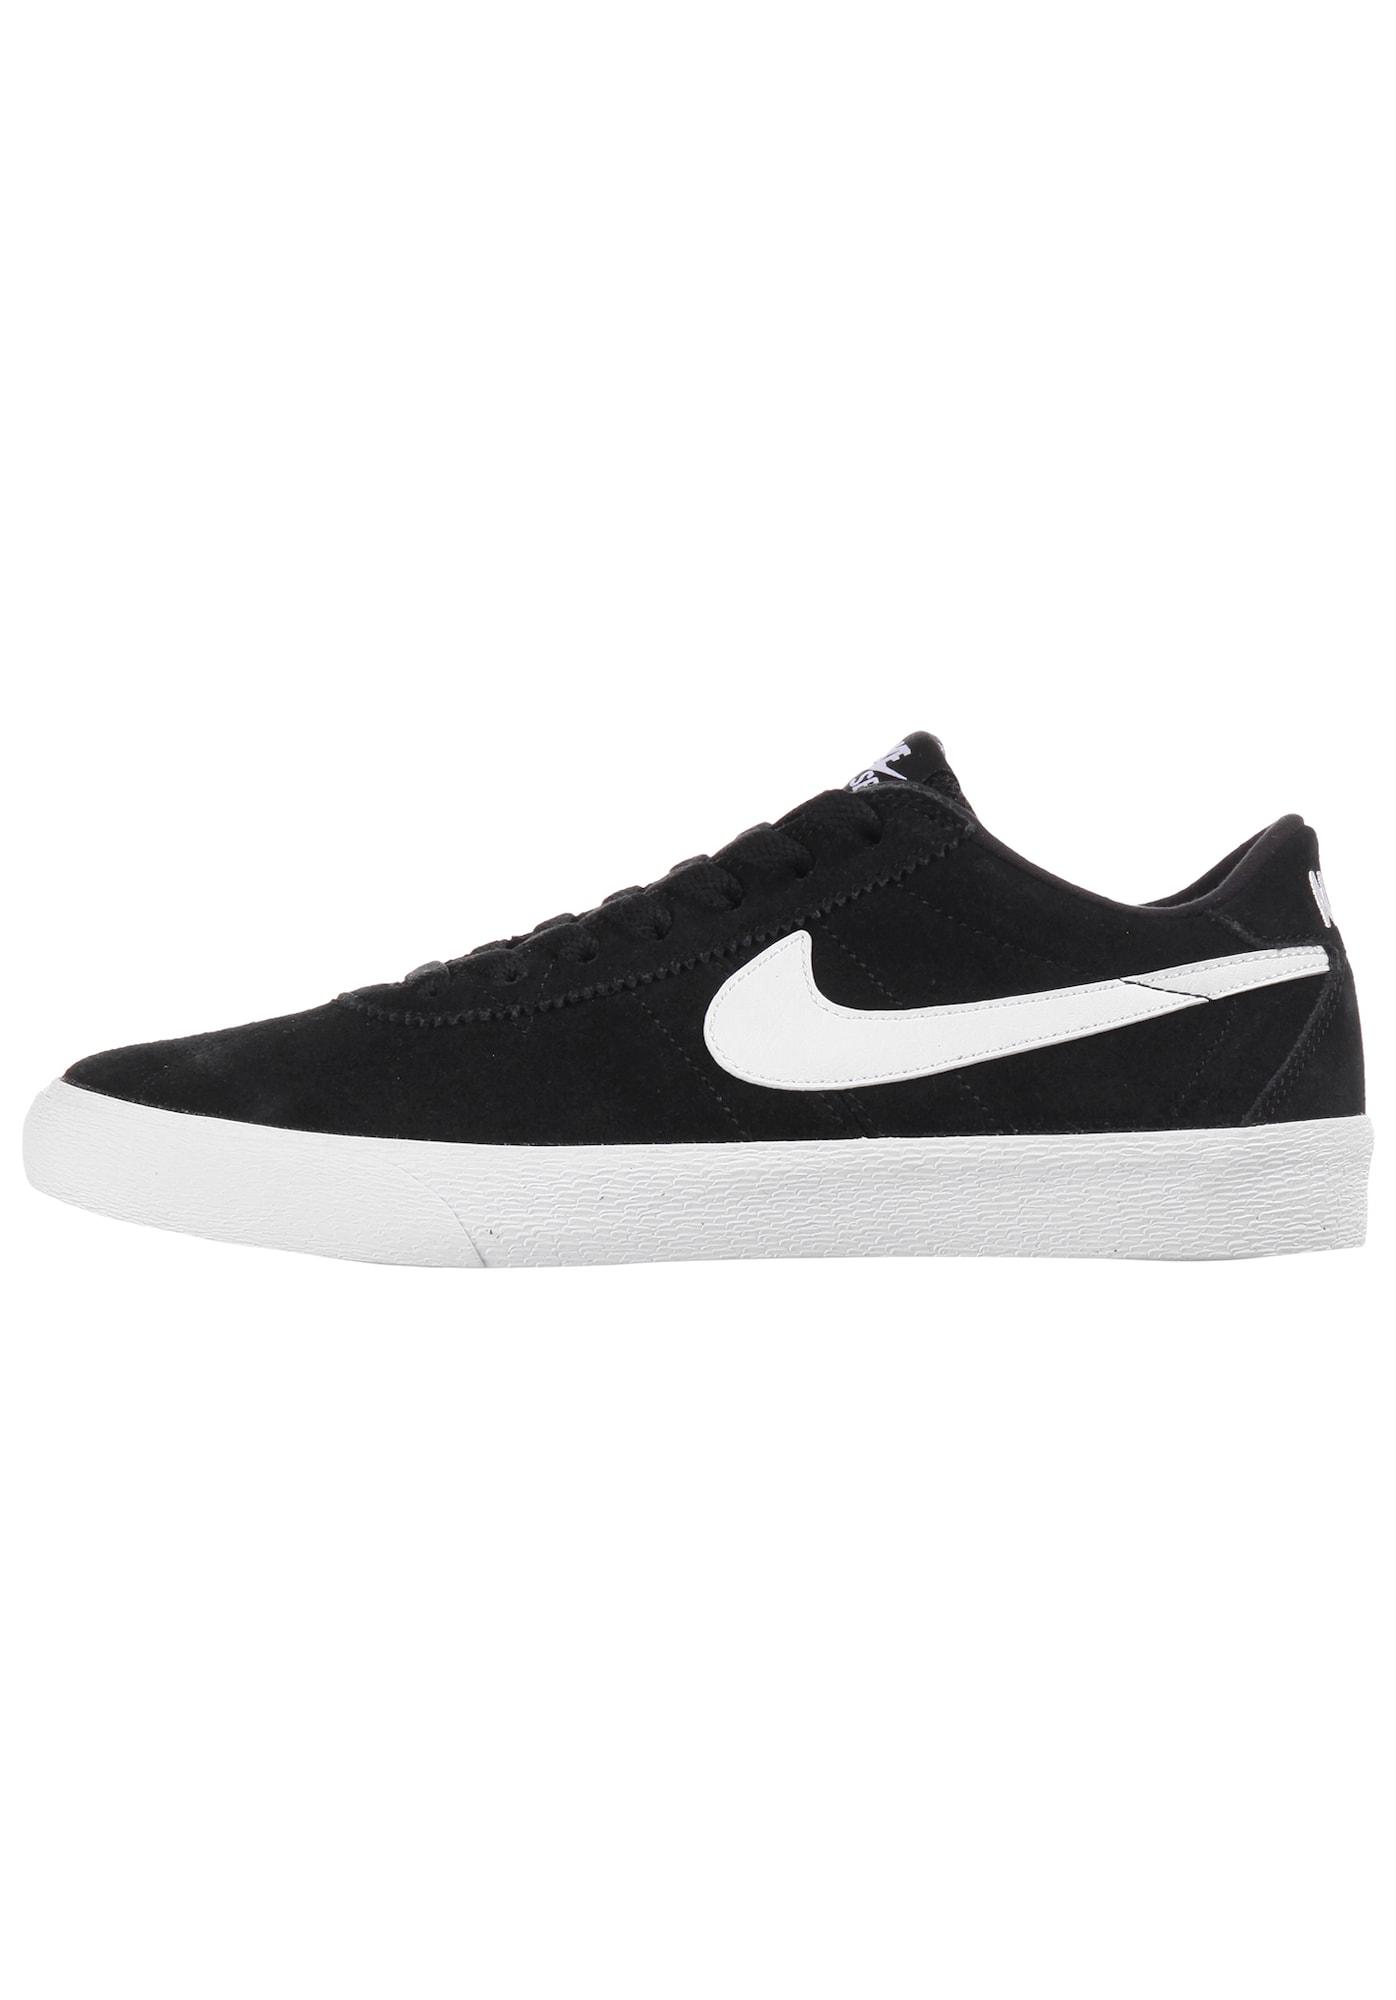 Nike SB, Damen Sneakers laag Bruin, zwart / wit